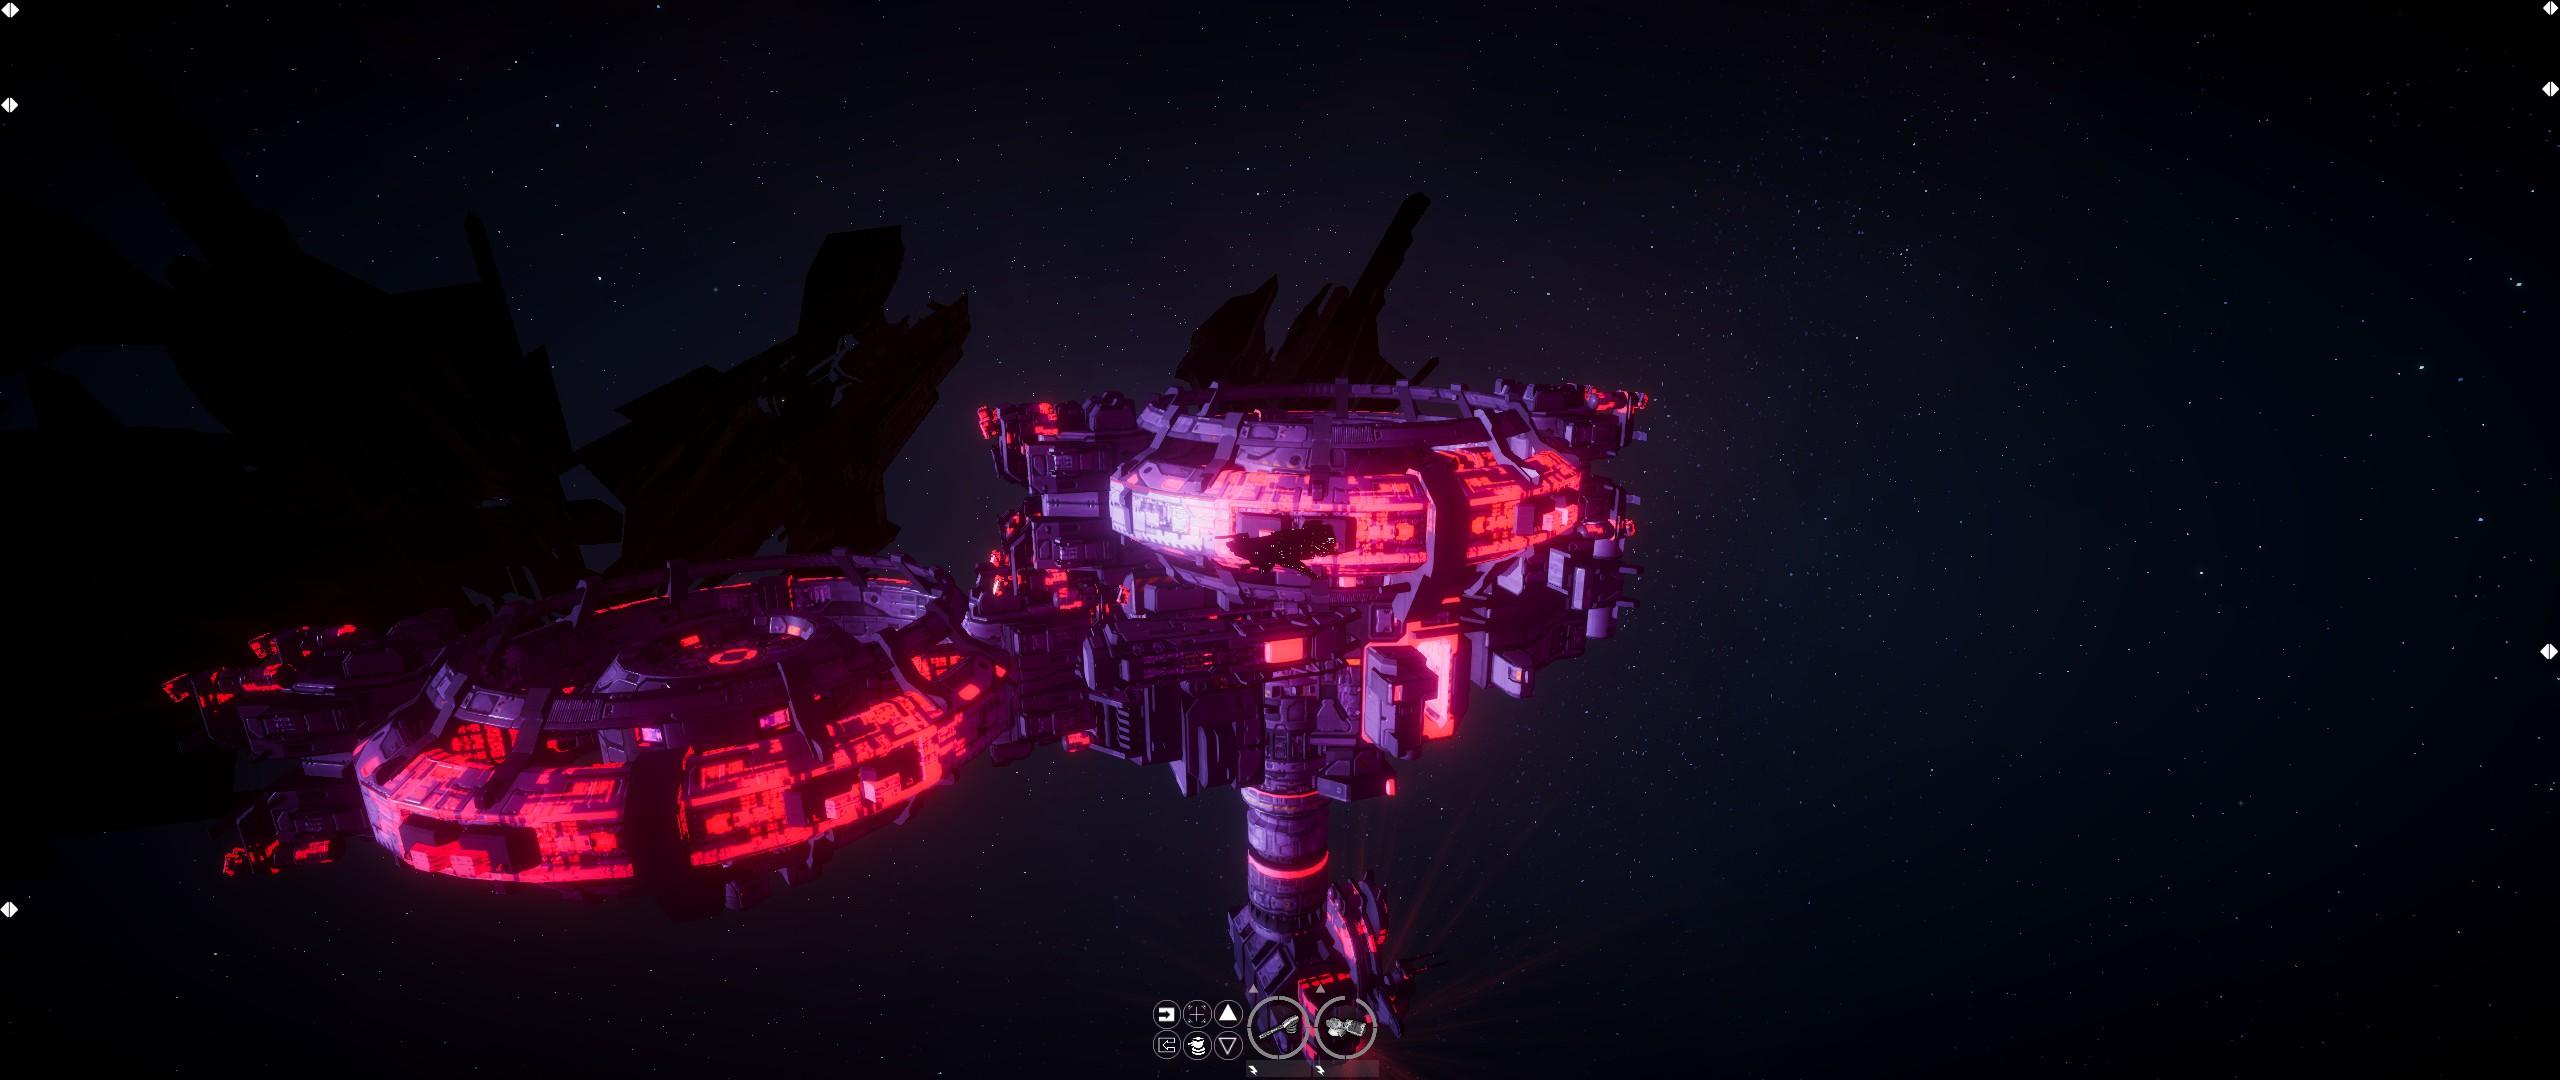 Astrox Imperium Астрокс Империум